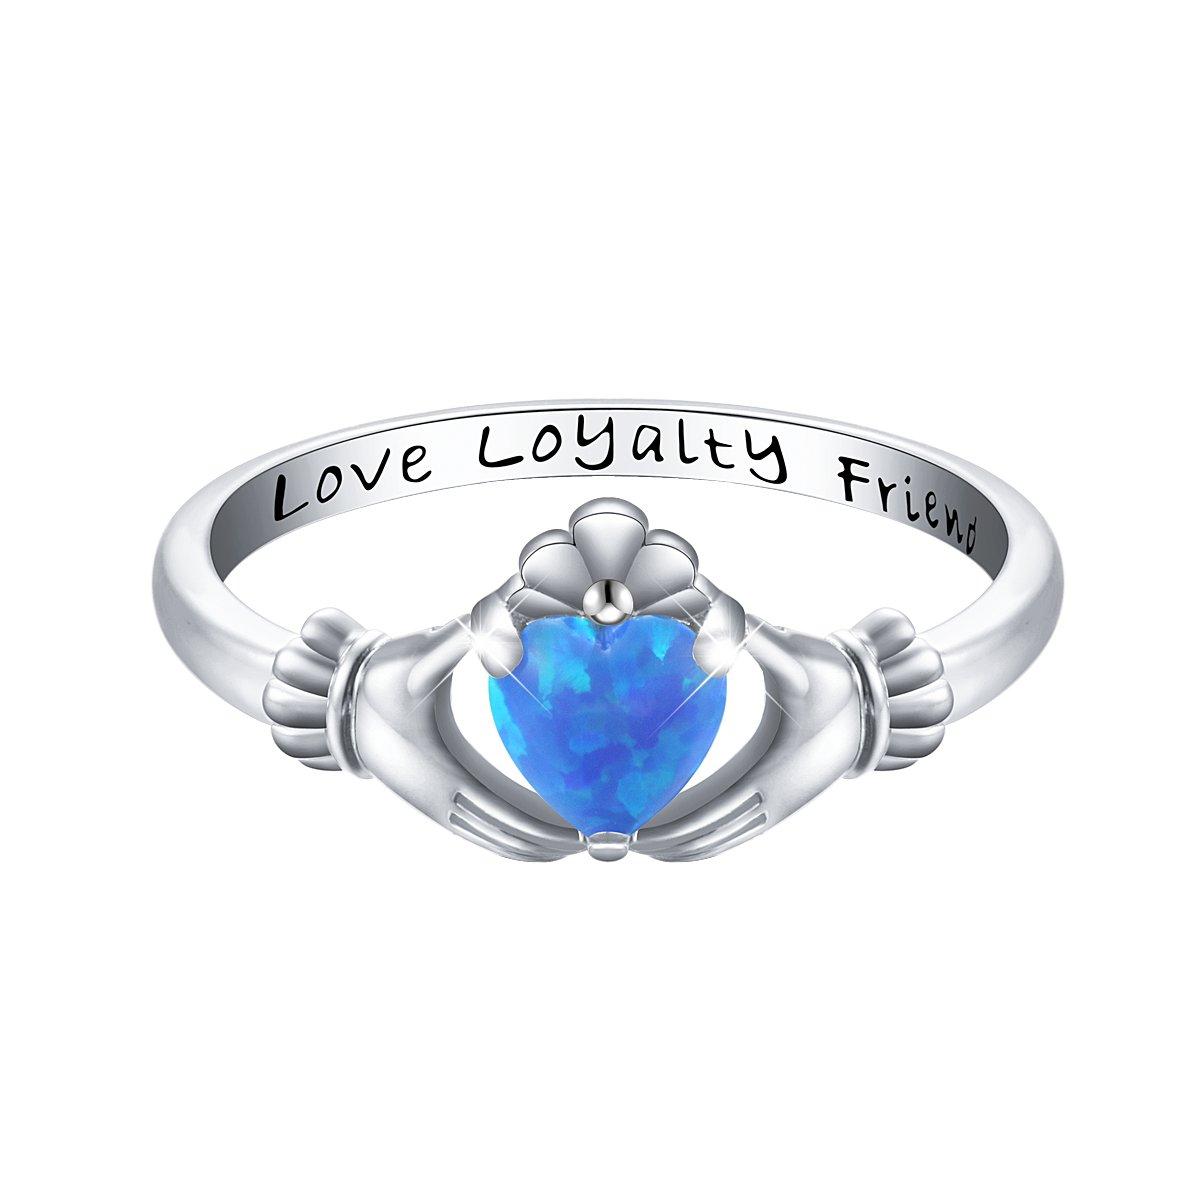 S925 Sterling Silver Love Loyalty Friendship Irish Ladies' Claddagh Ring Silver Light Jewelry